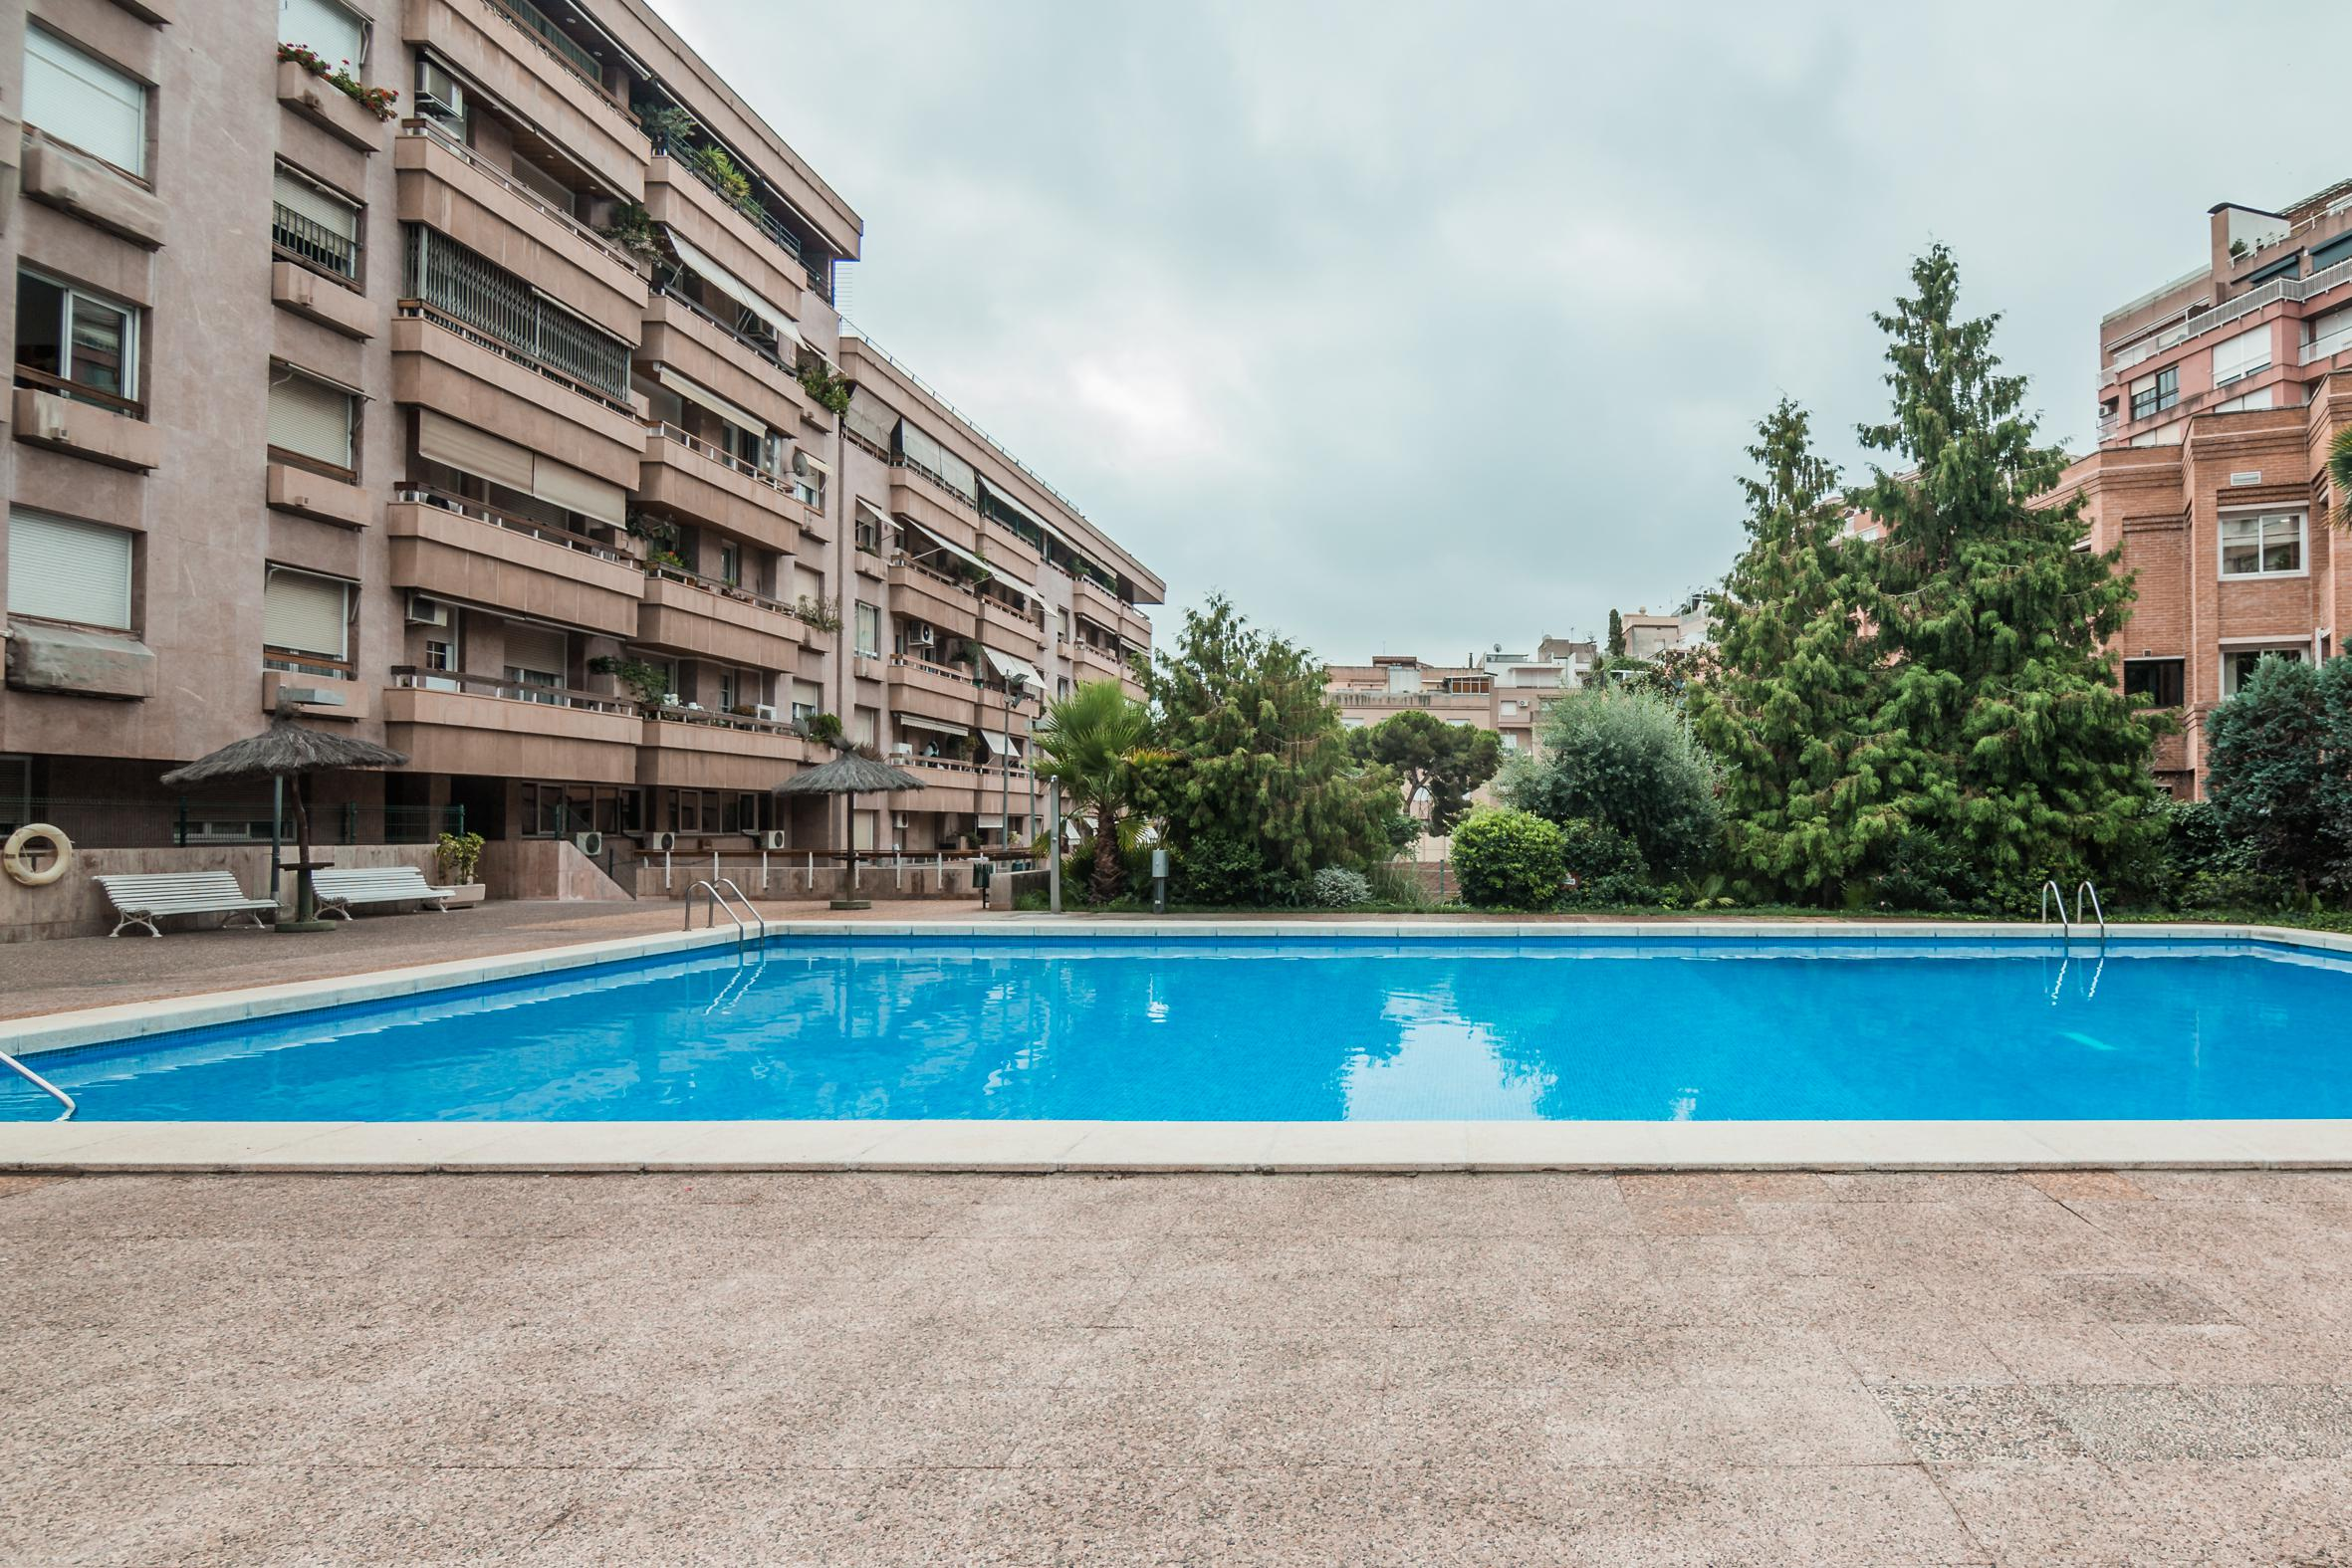 192050 - Plaza Bonanova - Sant Gervasi